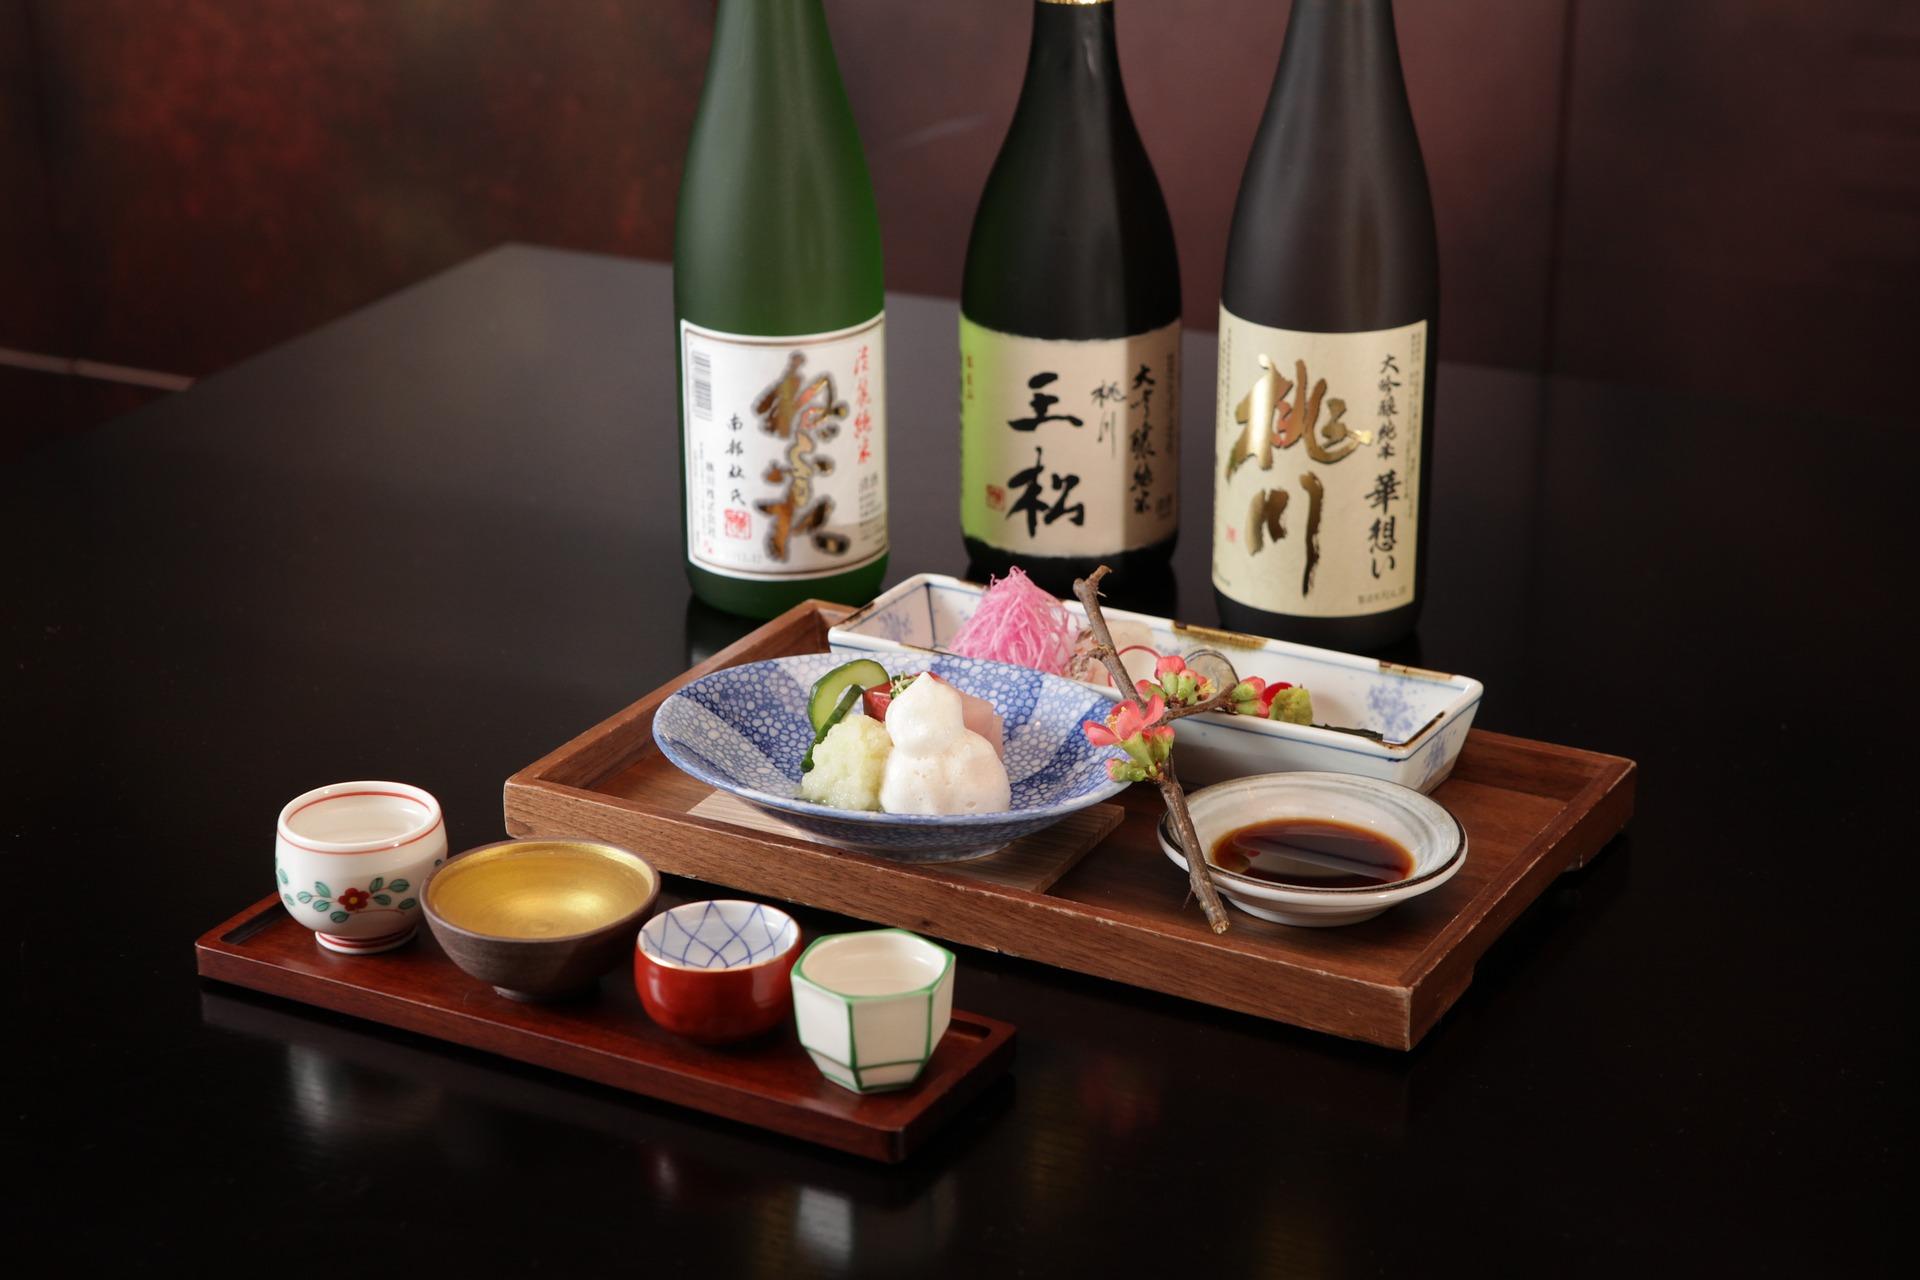 mirin and sushi